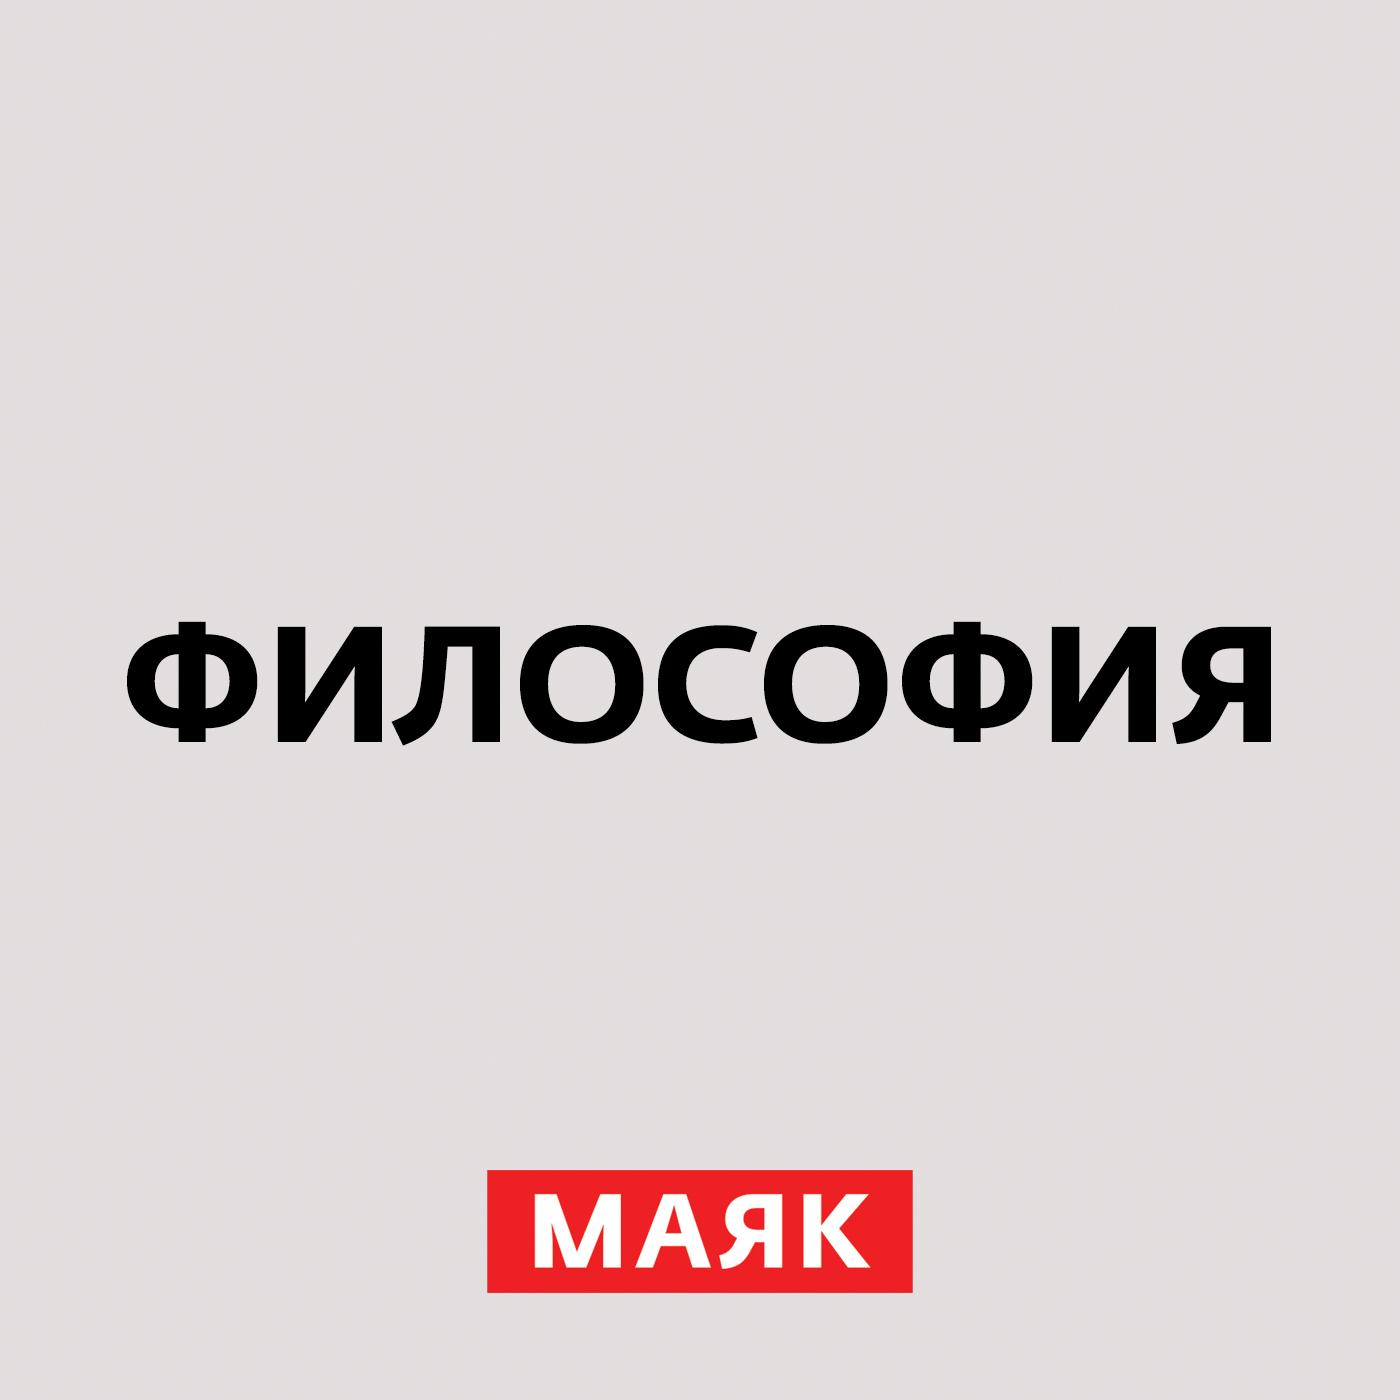 Творческий коллектив шоу «Объект 22» Иммануил Кант: общие положения